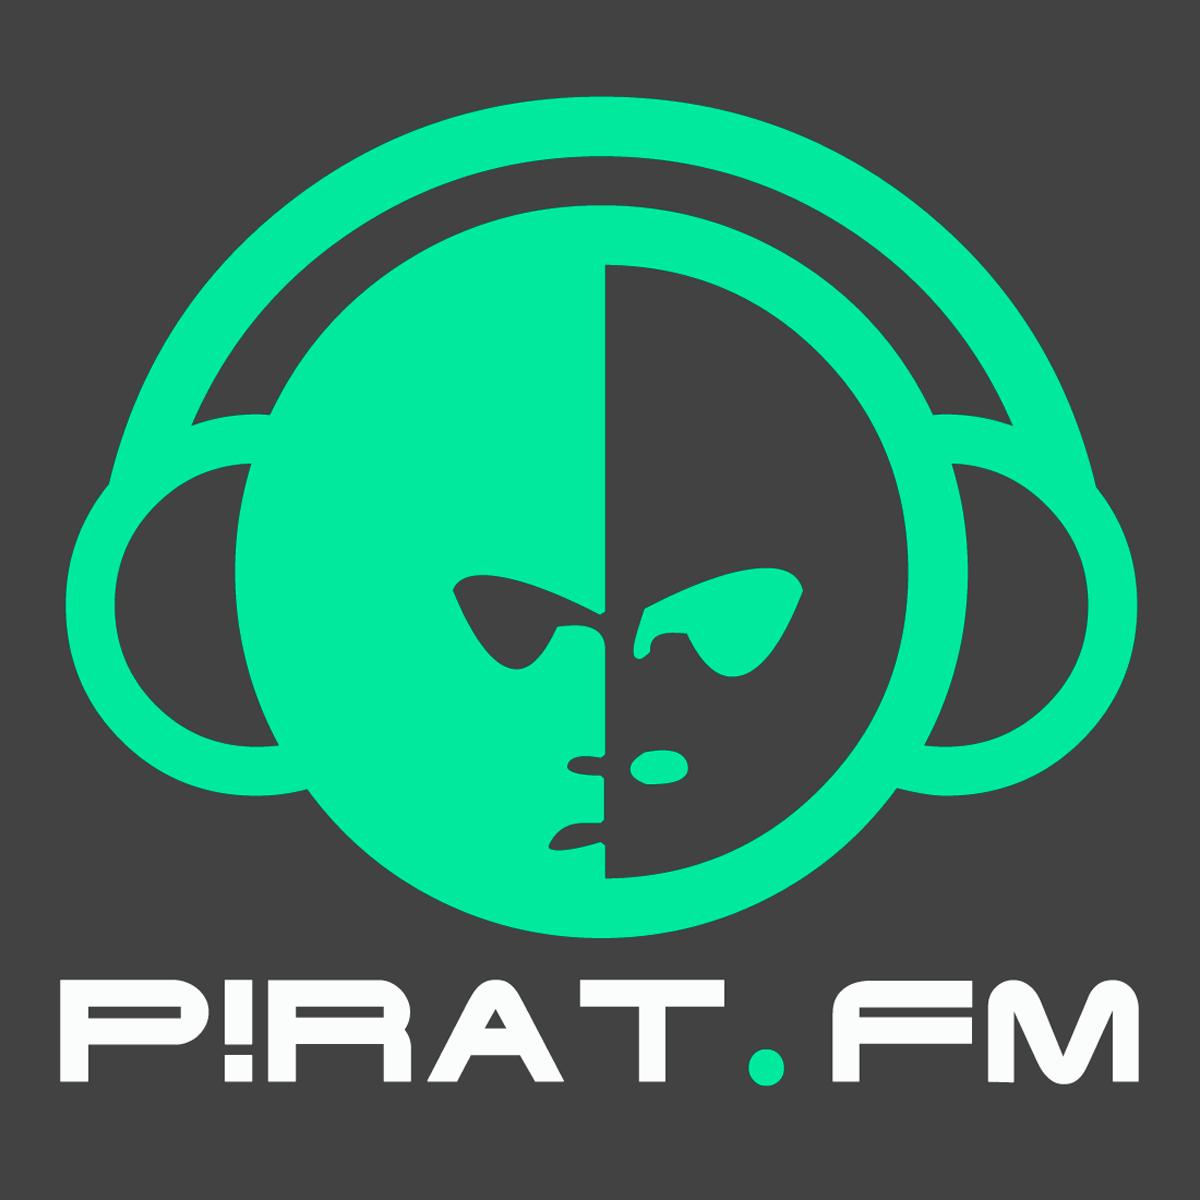 PIRAT.FM